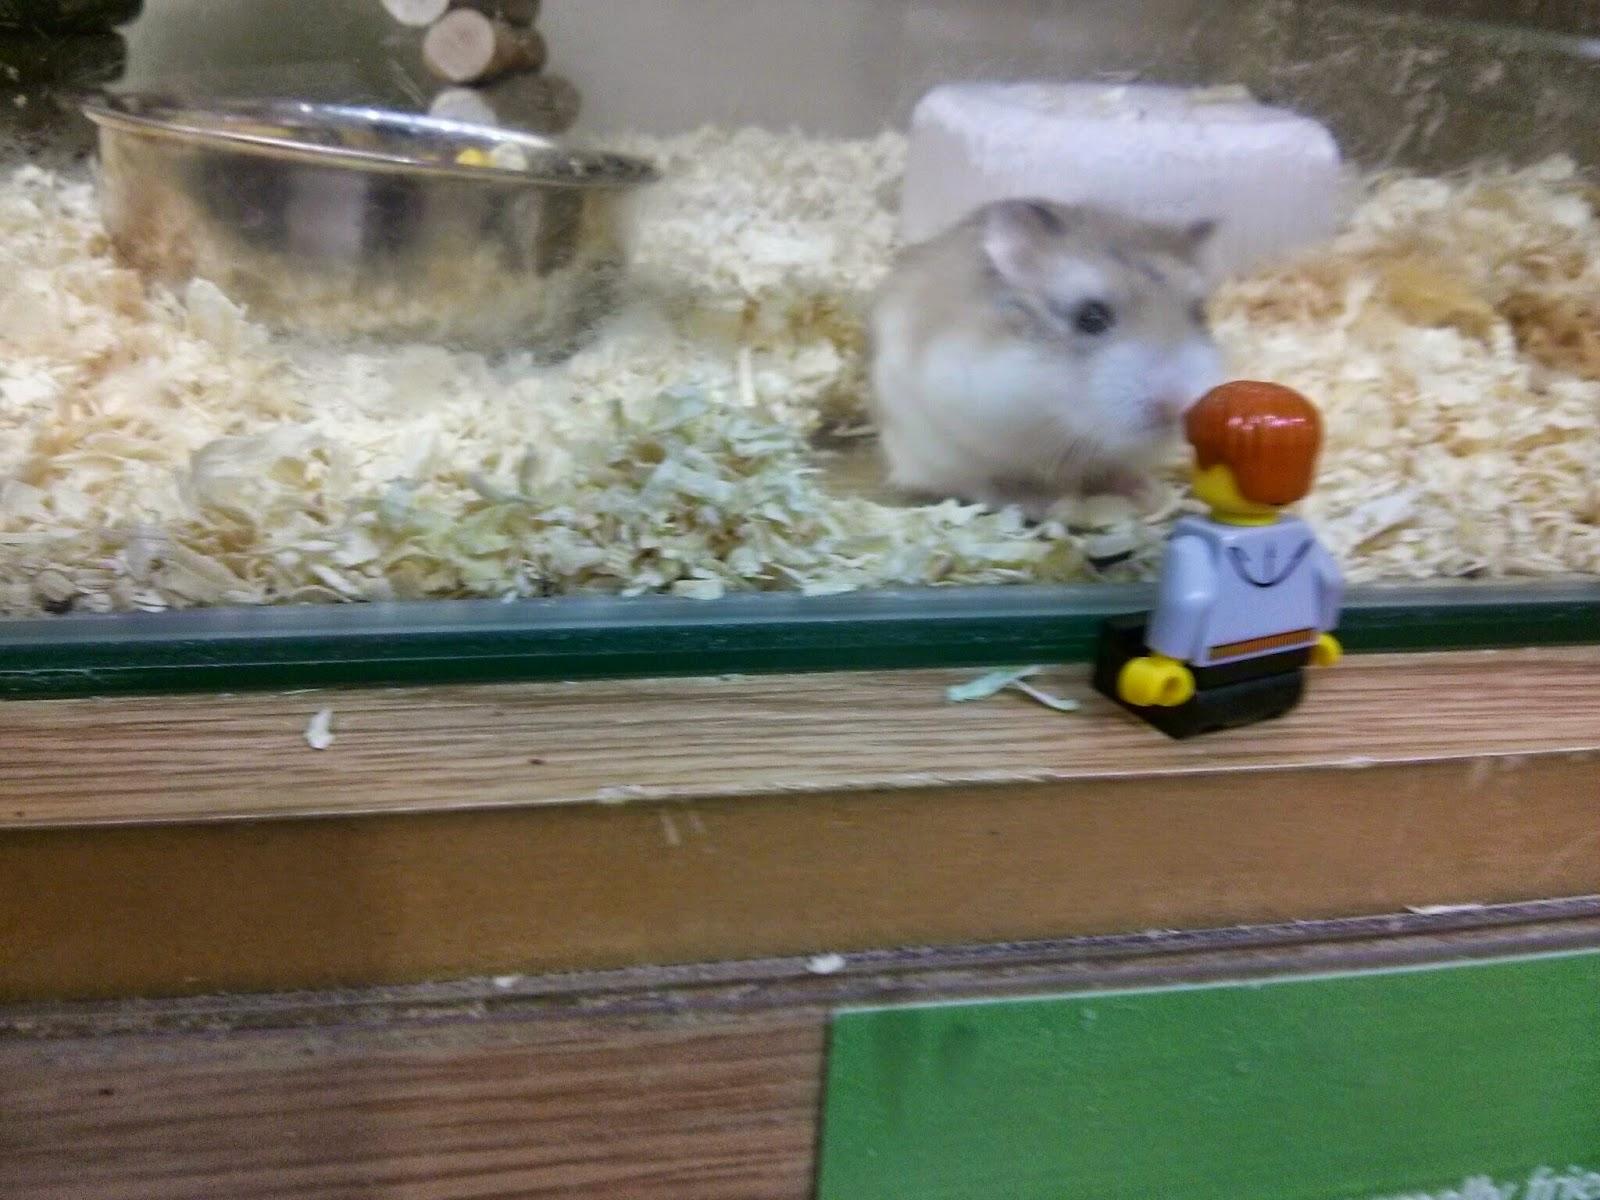 Hamster sniffing to Kyle Emmett